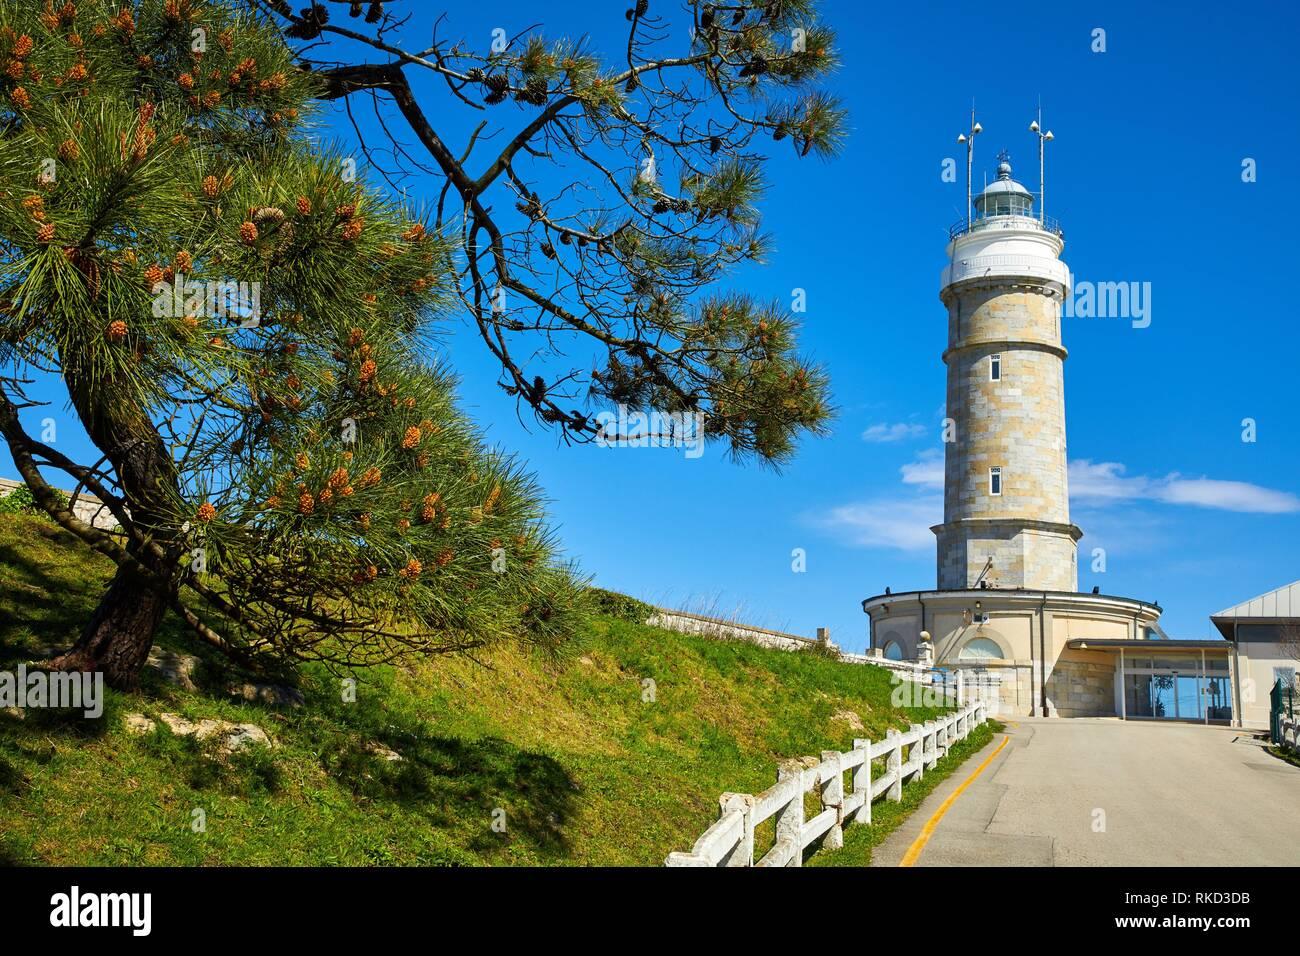 Lighthouse of Cabo Mayor, Santander, Cantabria, Spain, Europe - Stock Image